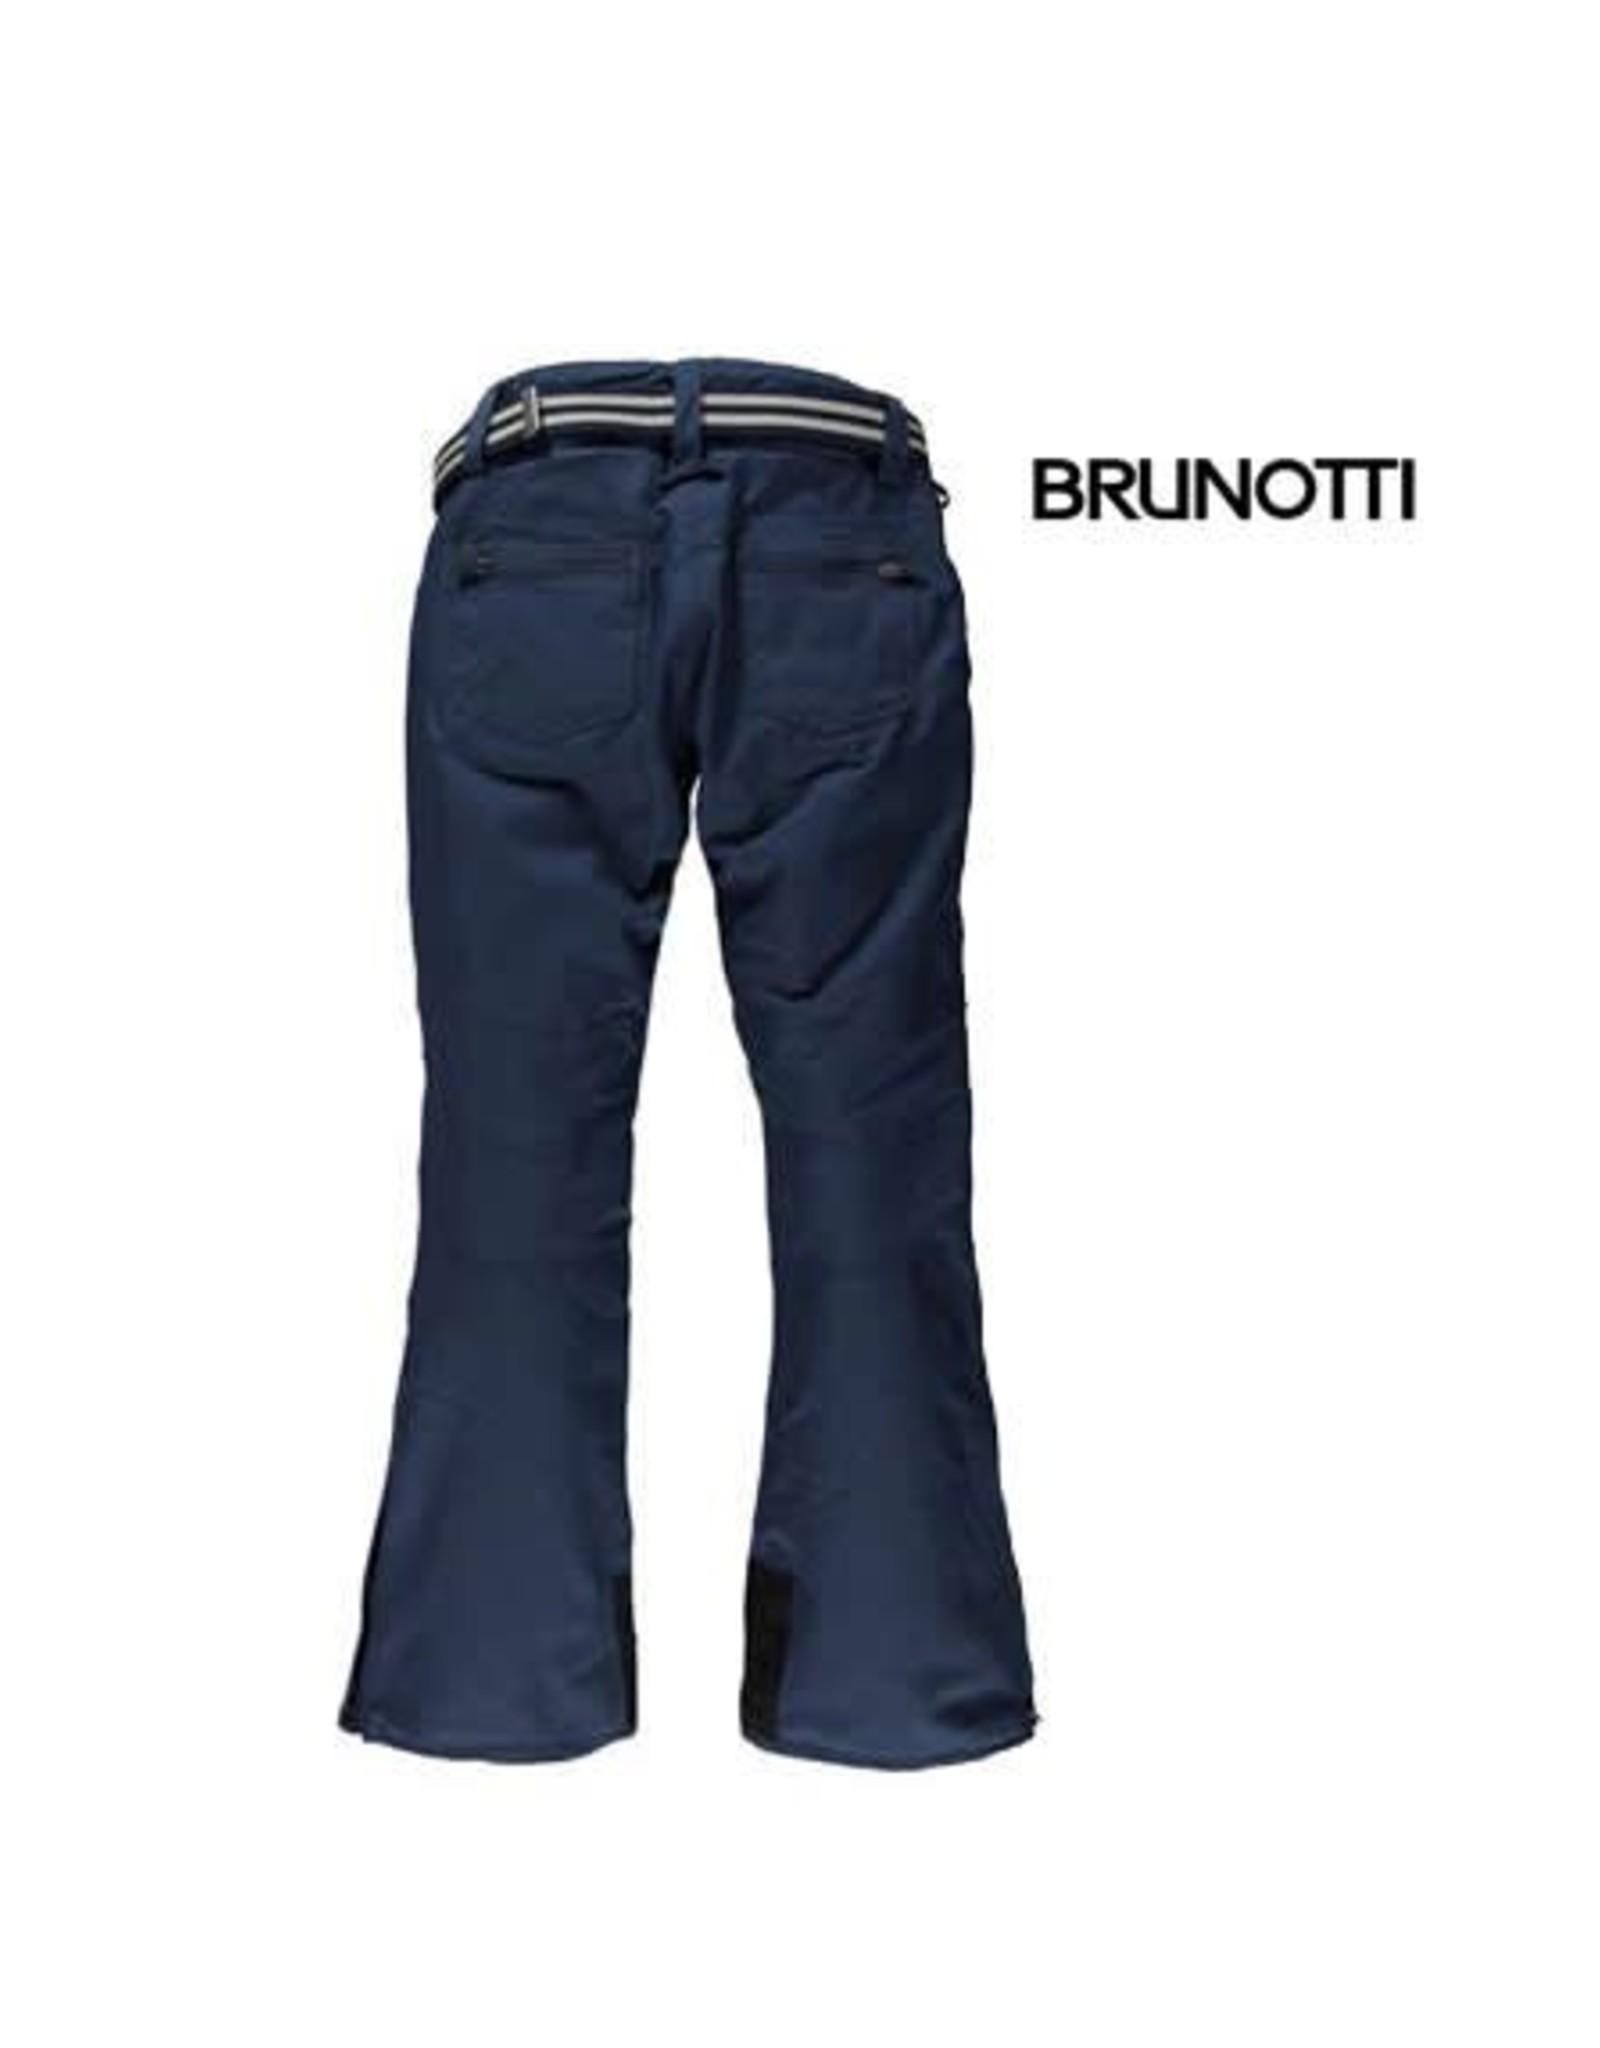 BRUNOTTI BRUNOTTI LAWN Skibroek Smoke / blauw